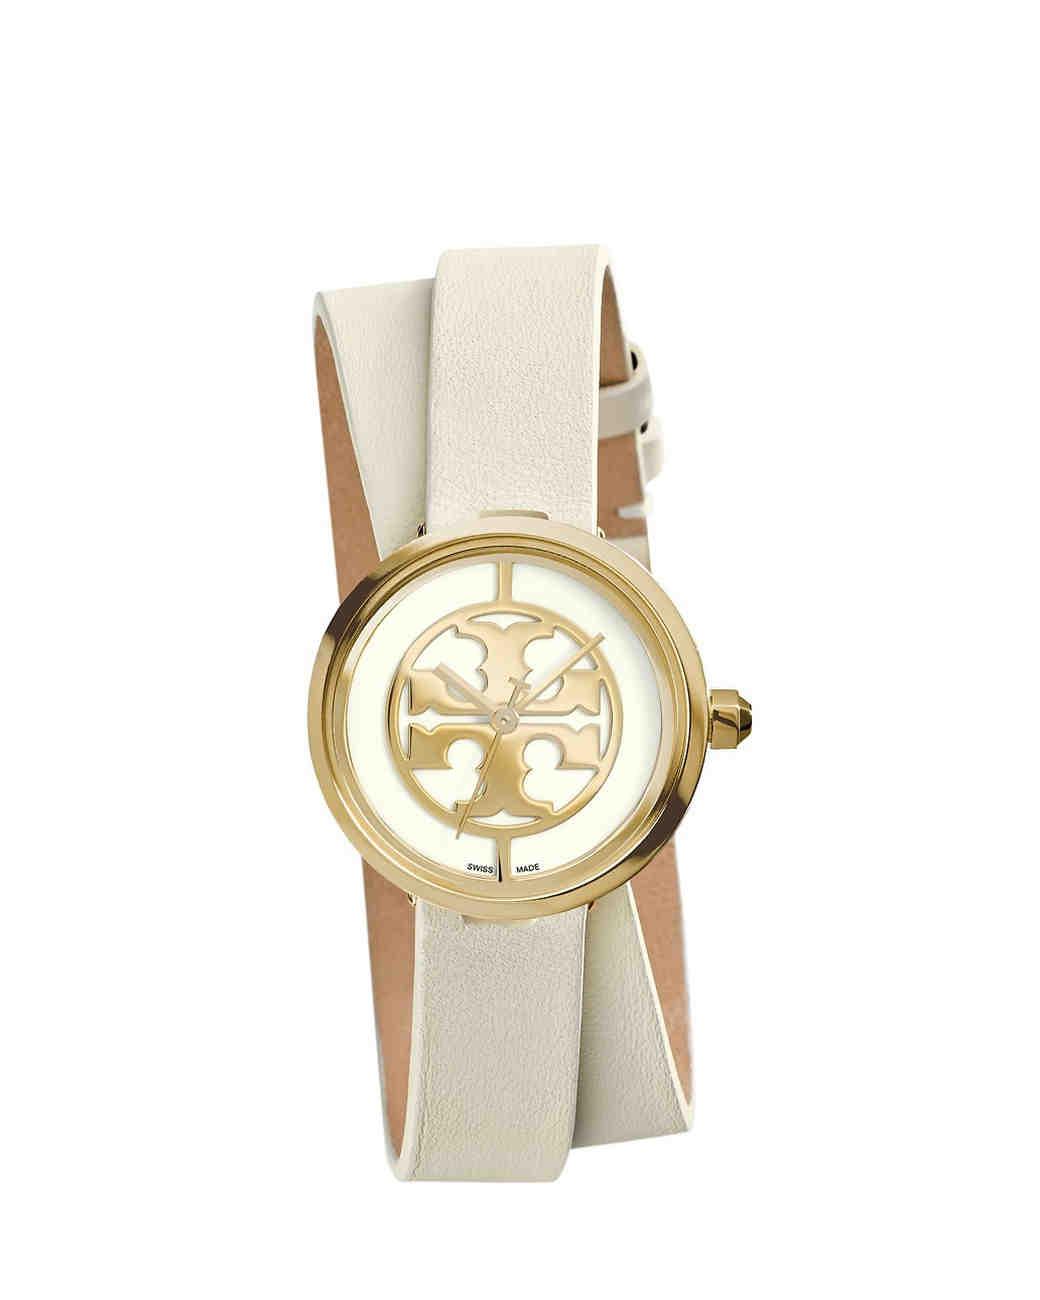 mother-bride-groom-gift-watch-0415.jpg